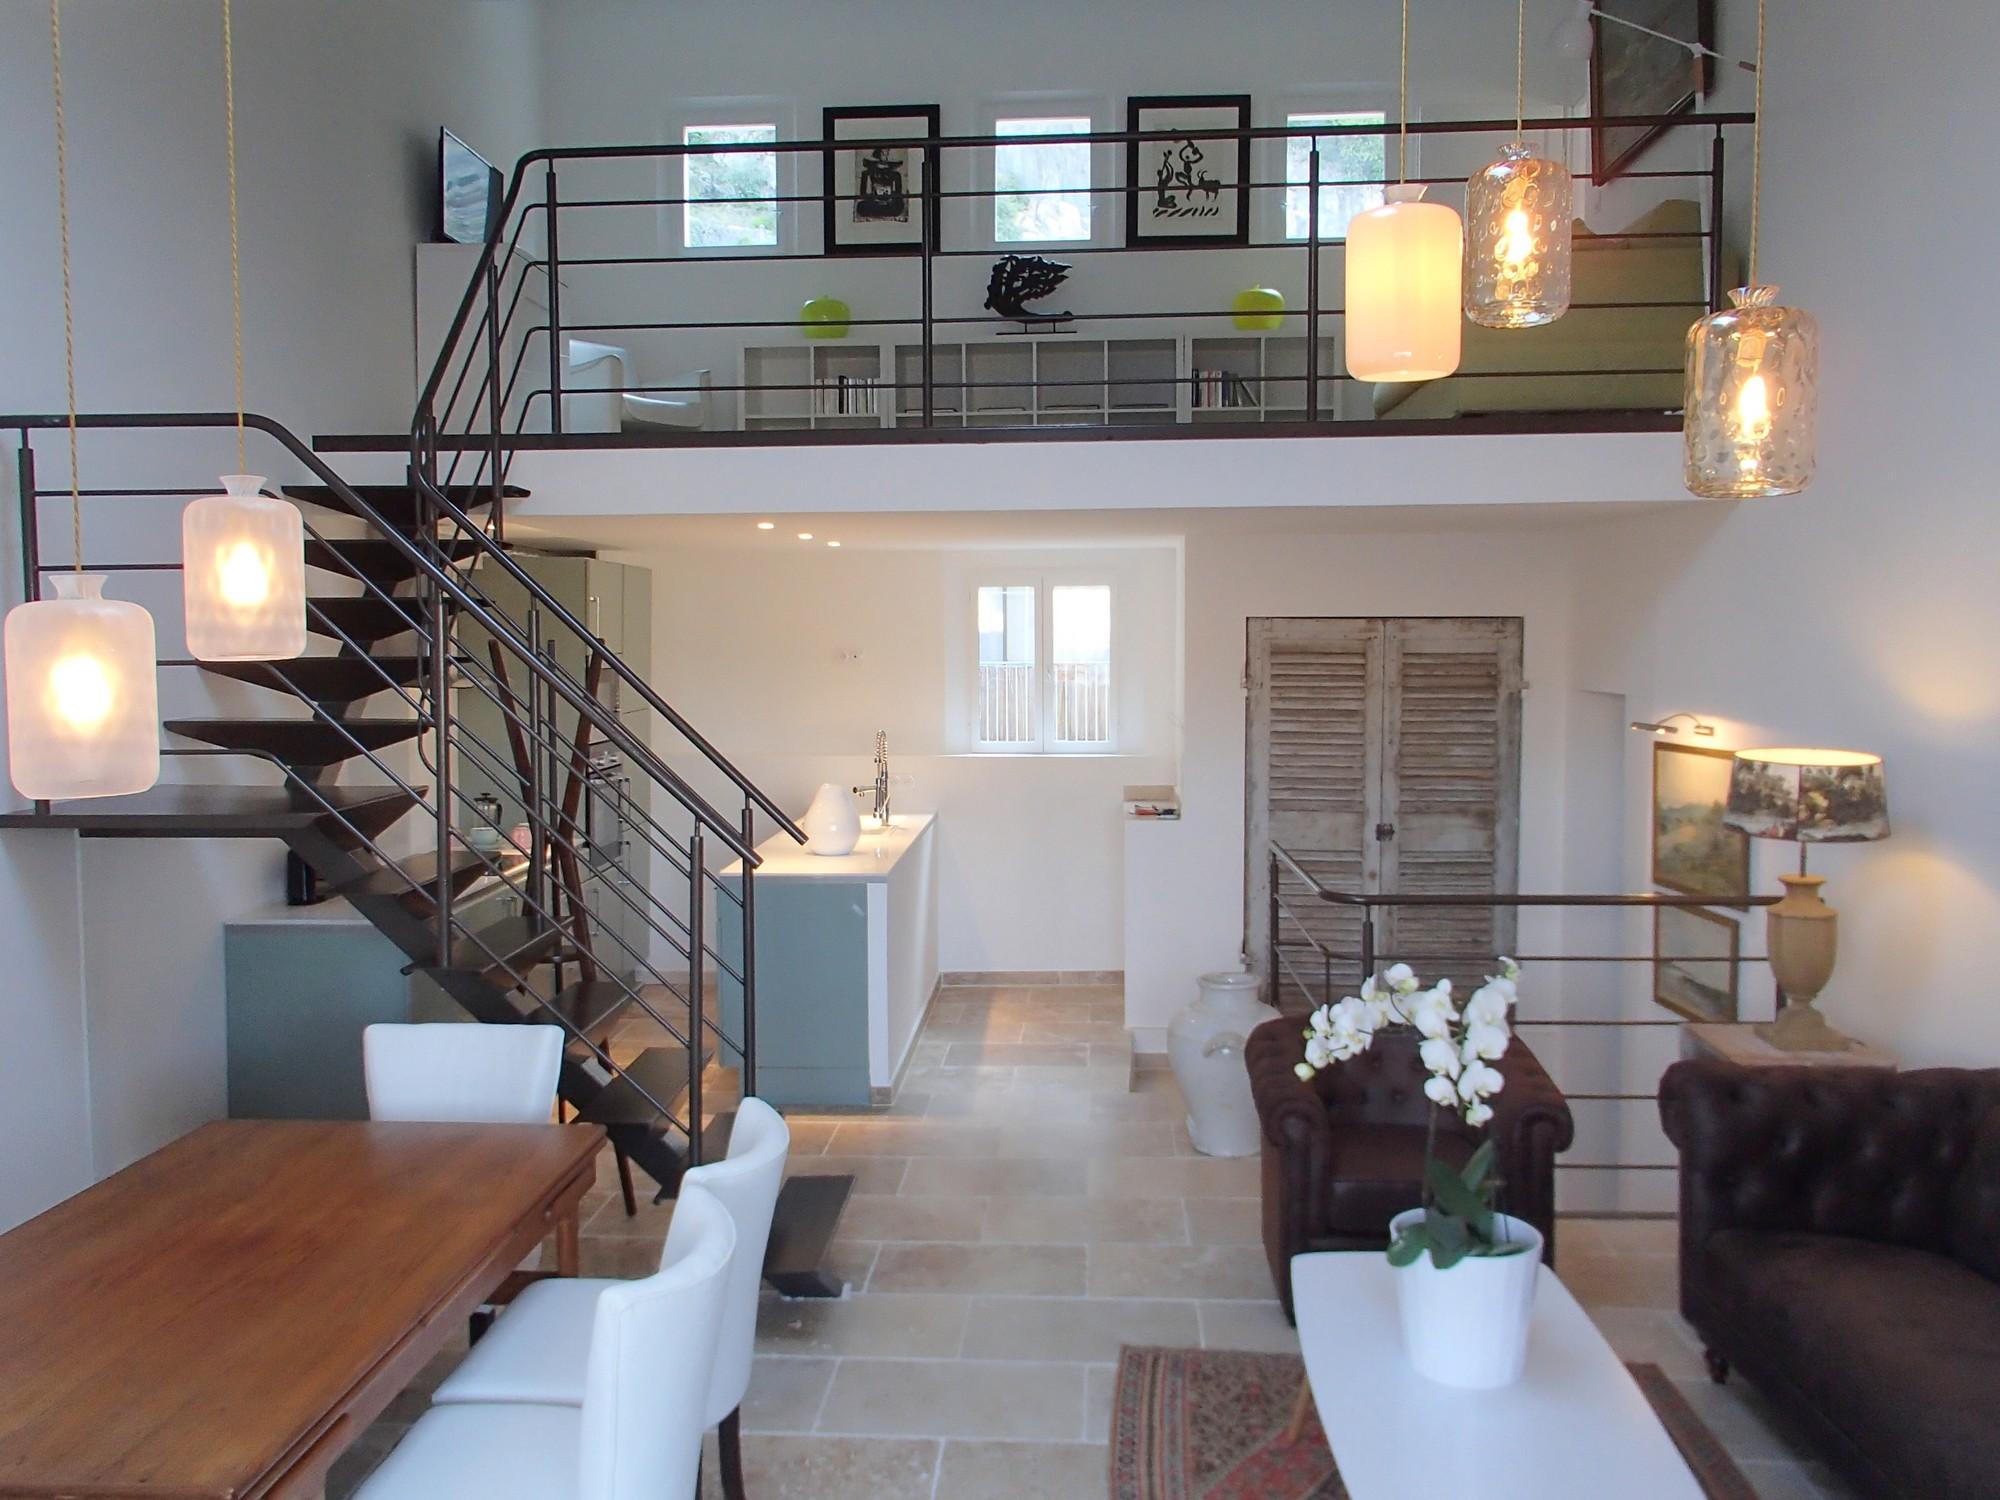 olympus digital camera table libre. Black Bedroom Furniture Sets. Home Design Ideas